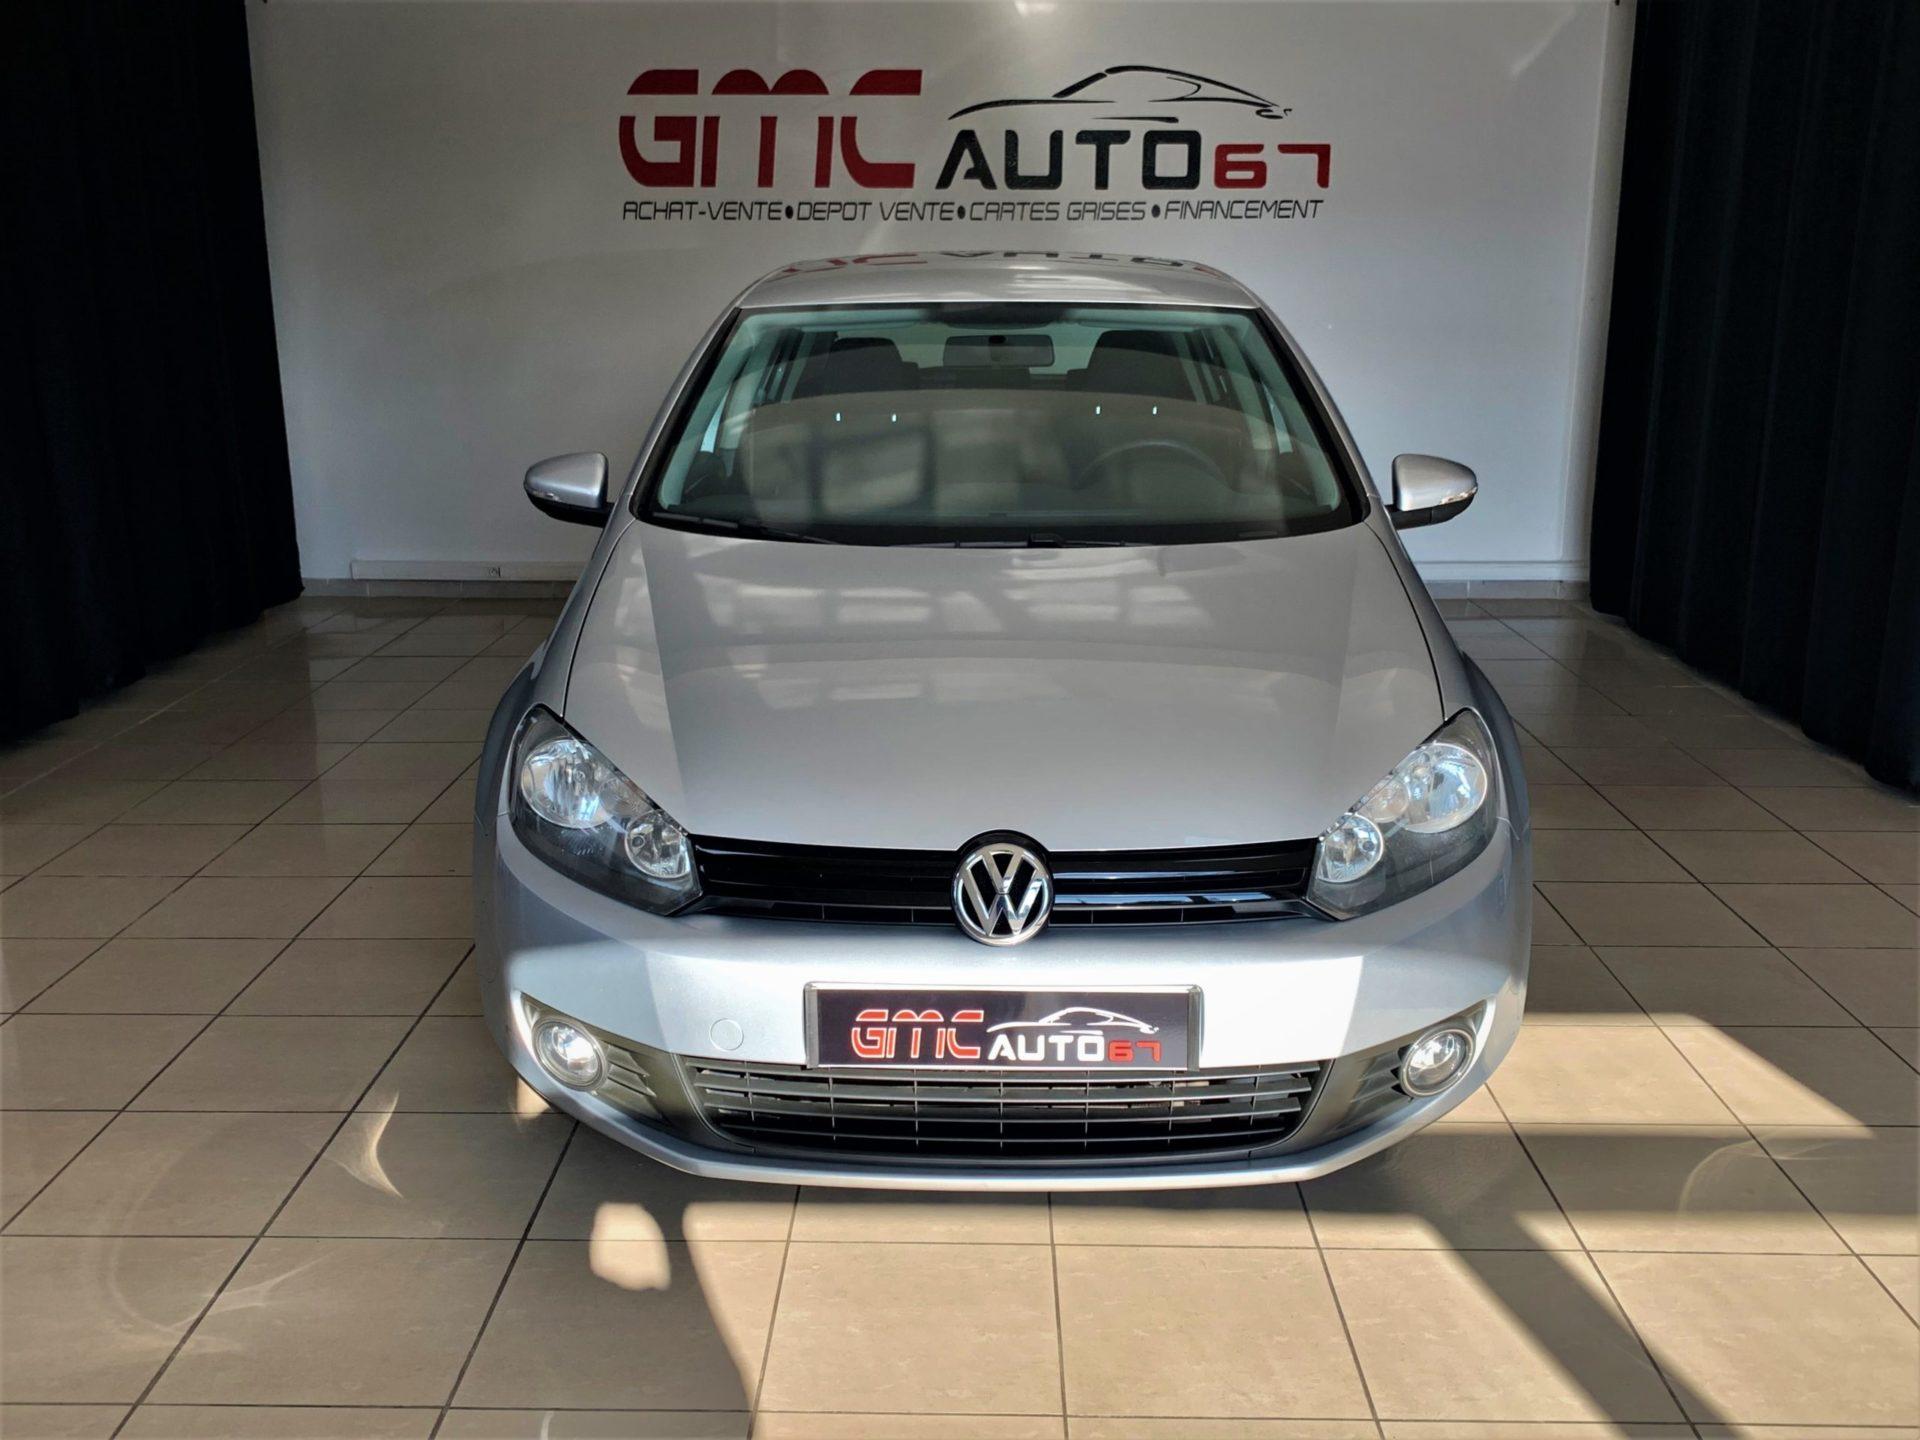 VW GOLF 1.4 16S 80CH TRENDLINE - GMC AUTO 67